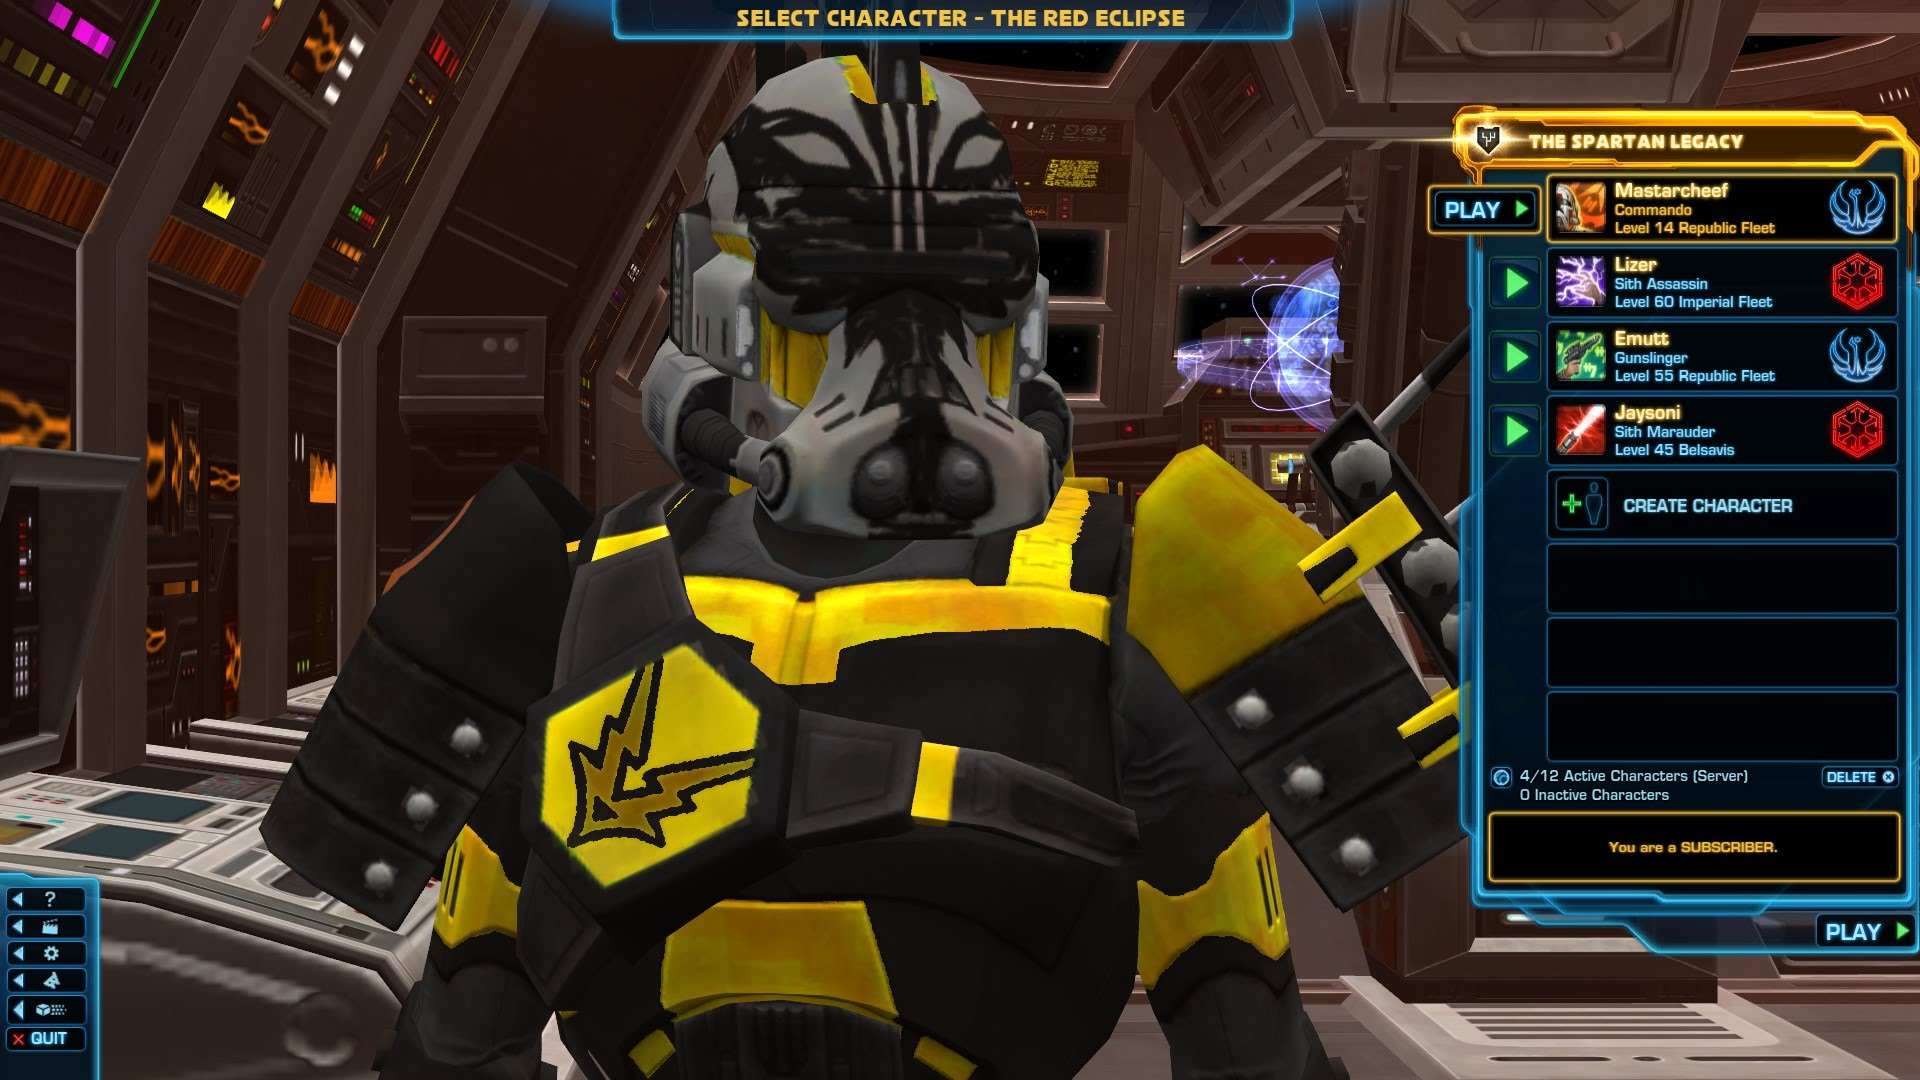 Kotfe Level 60 Character Creation Is Bugged Star Wars Gaming Star Wars Gaming News